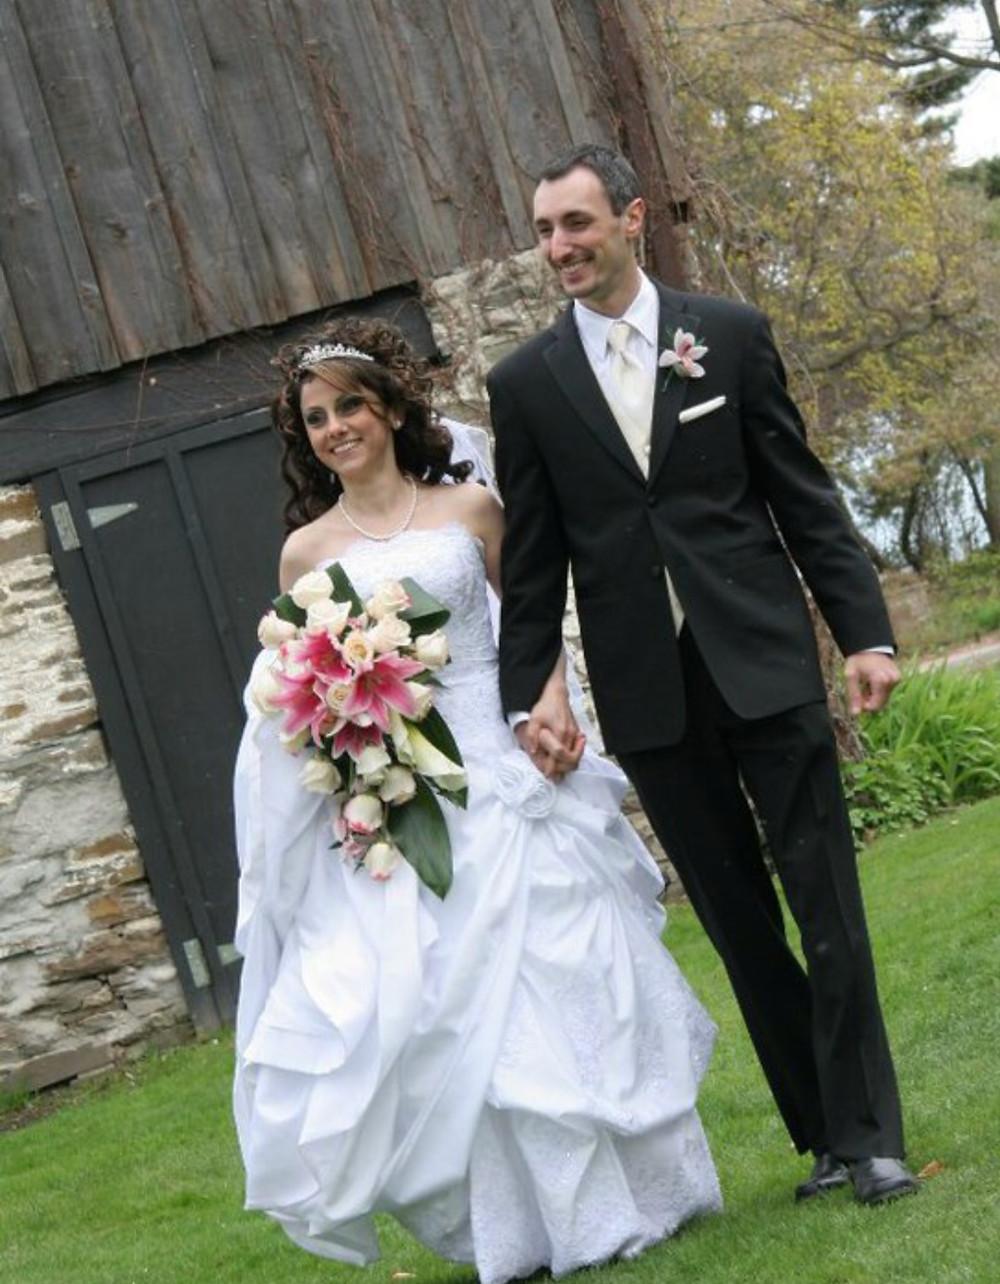 Mark and Asmaa on their wedding day